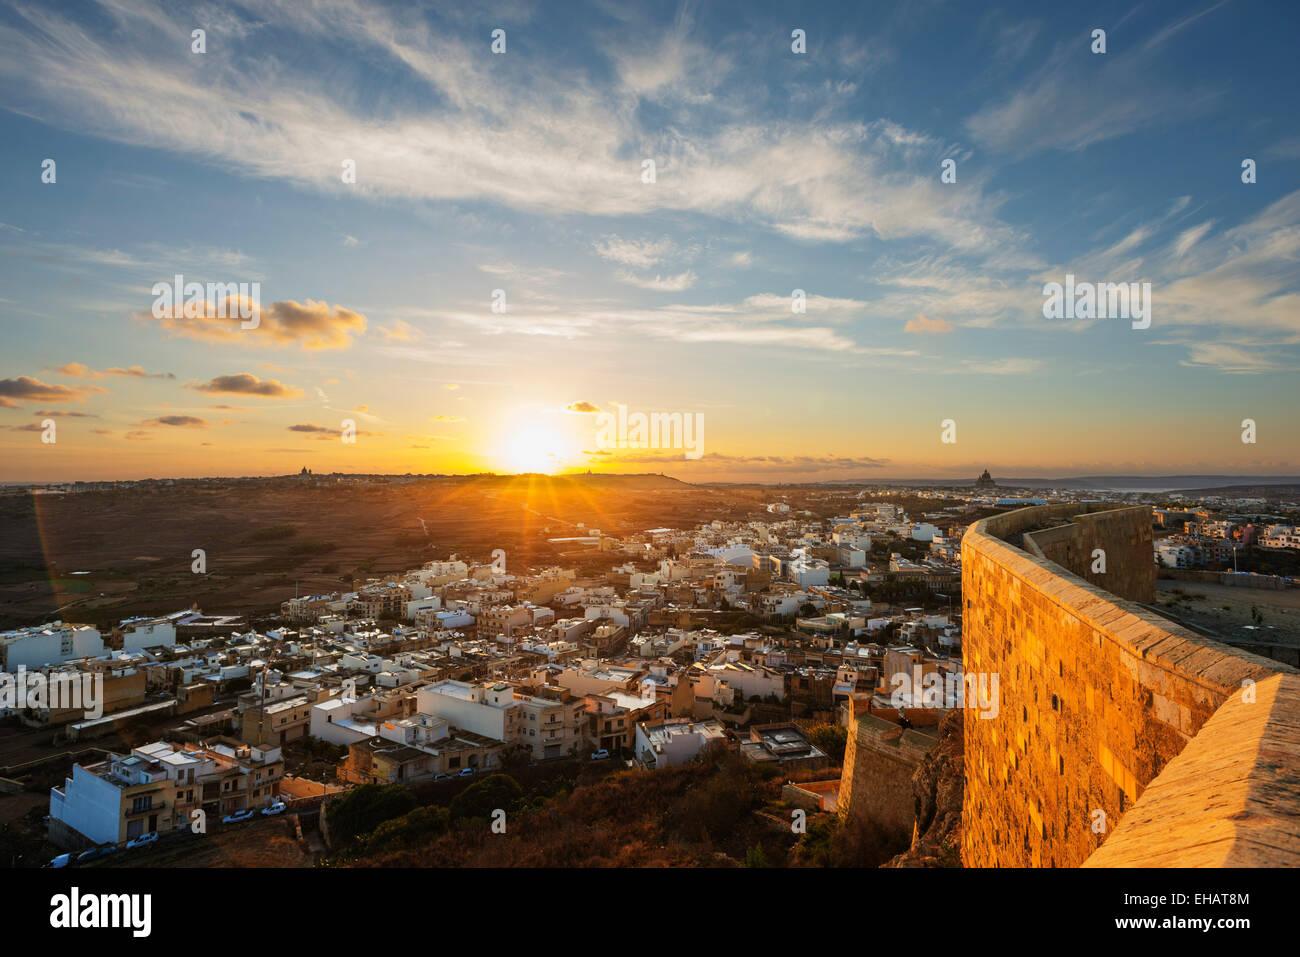 Mediterranean Europe, Malta, Gozo Island, Victoria (Rabat), sunrise from Il-Kastell citadel fortress - Stock Image